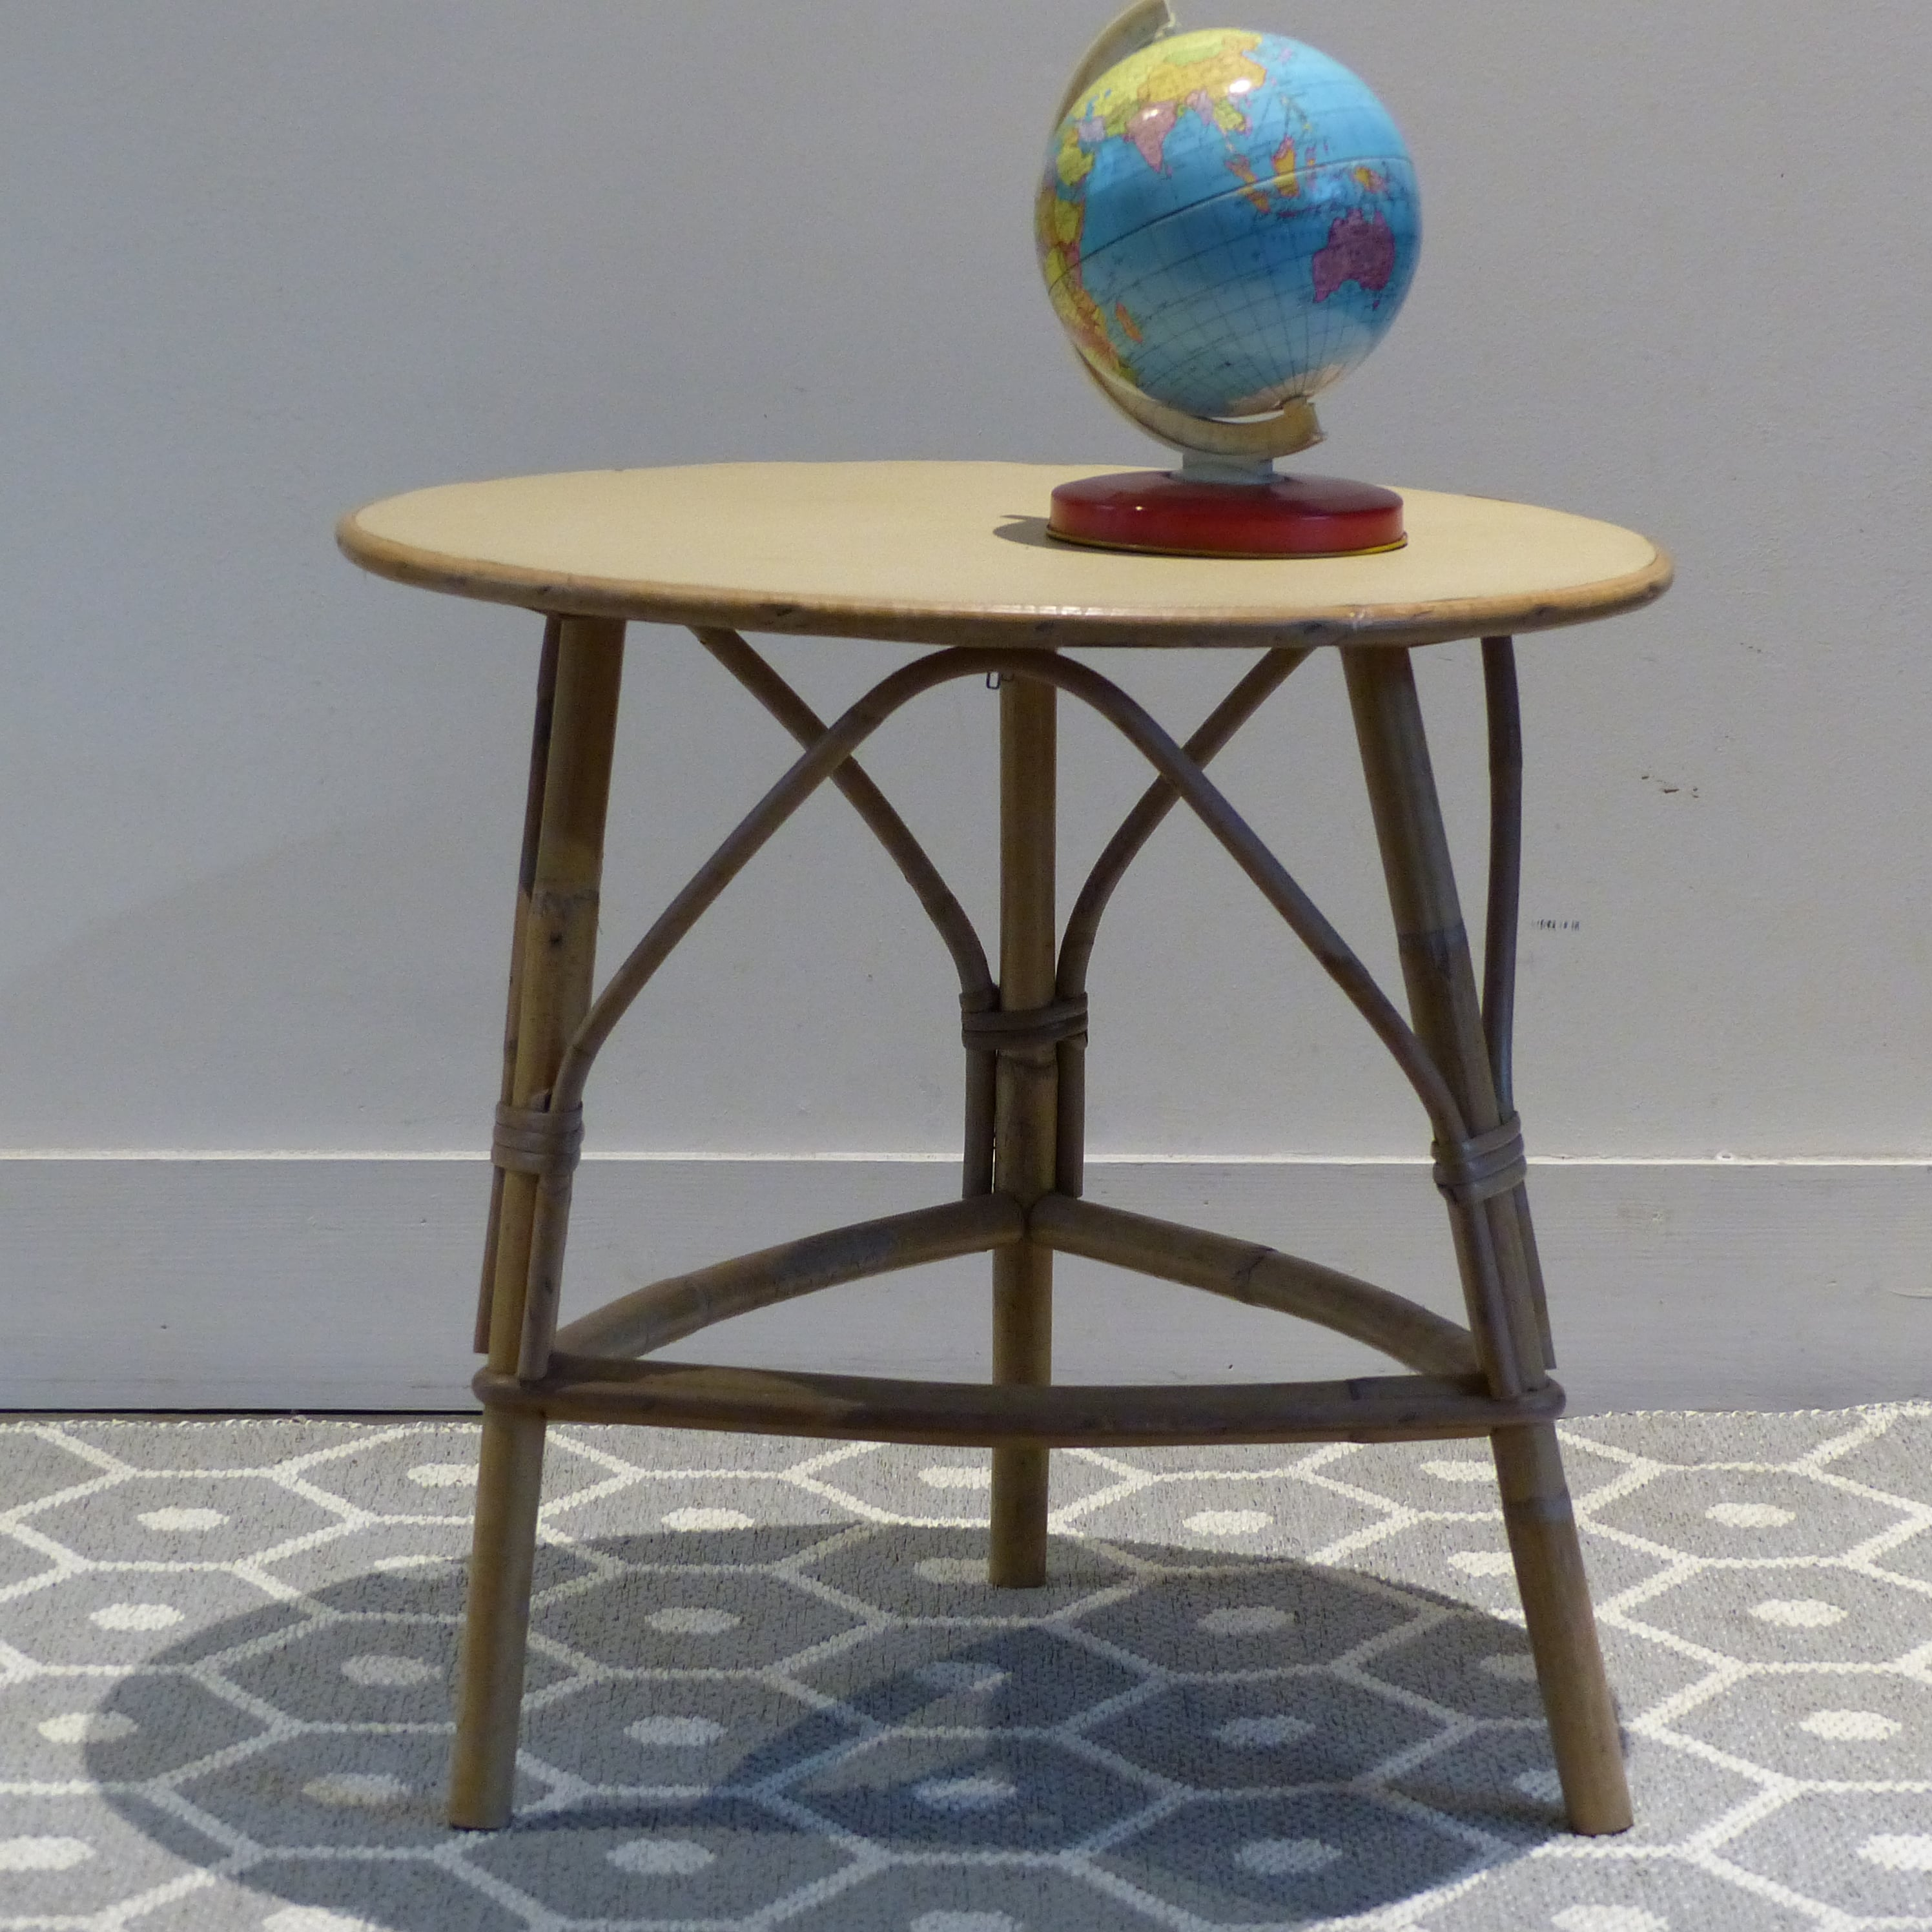 Petite table pour enfant en rotin lignedebrocante for Petite table pour enfants